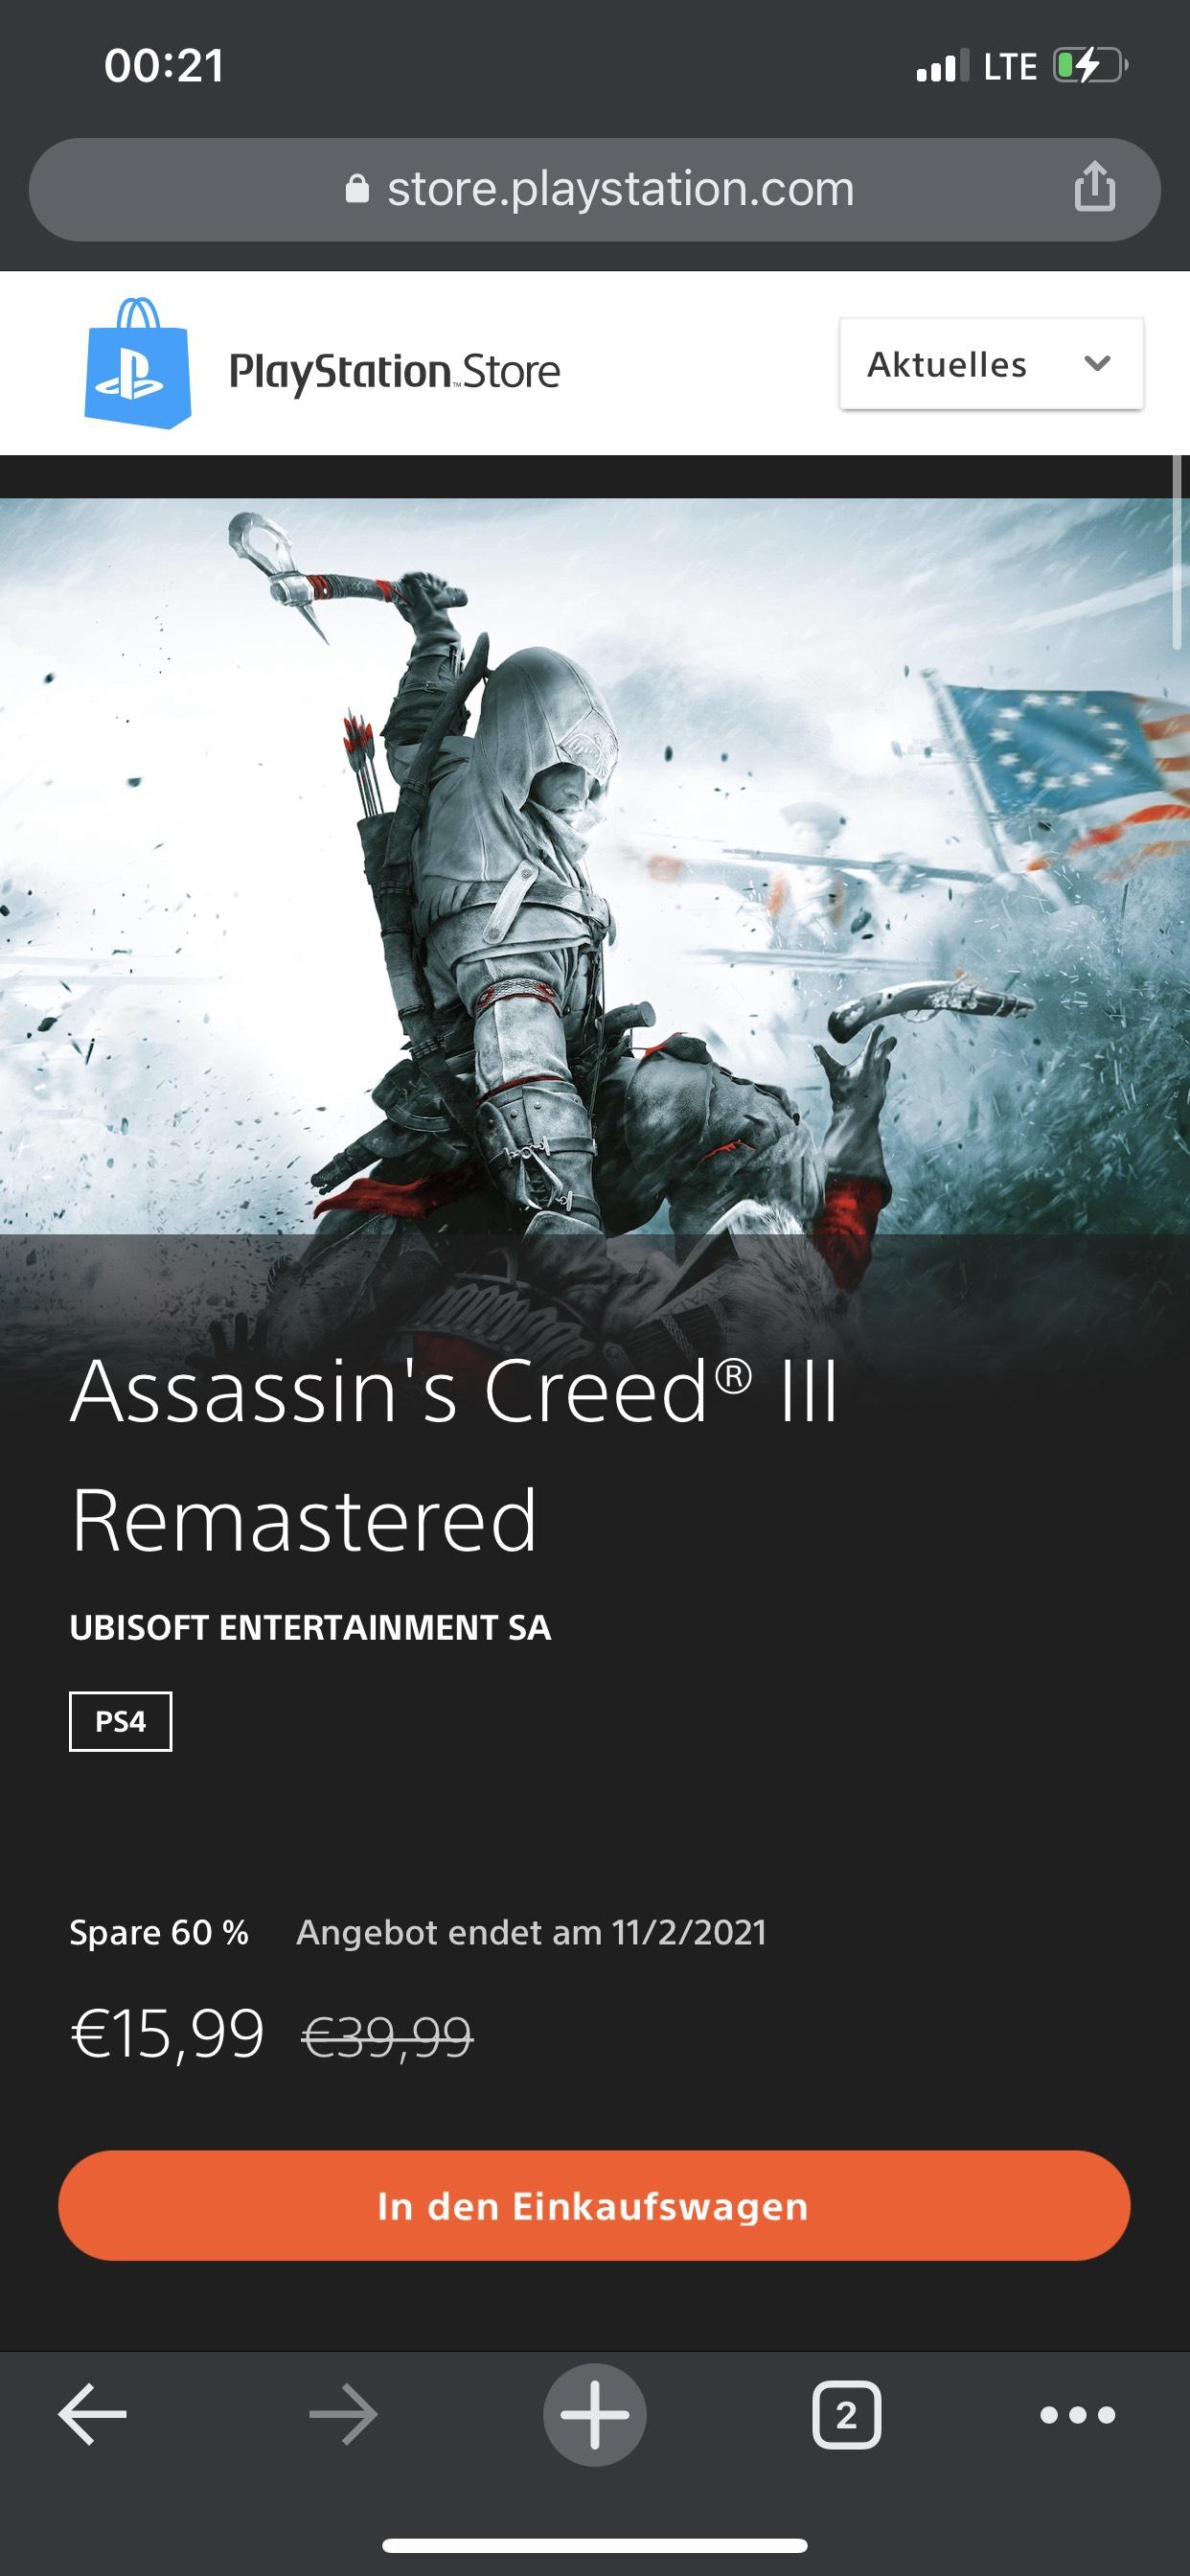 Assassin's Creed® III Remastered (PSN Store)